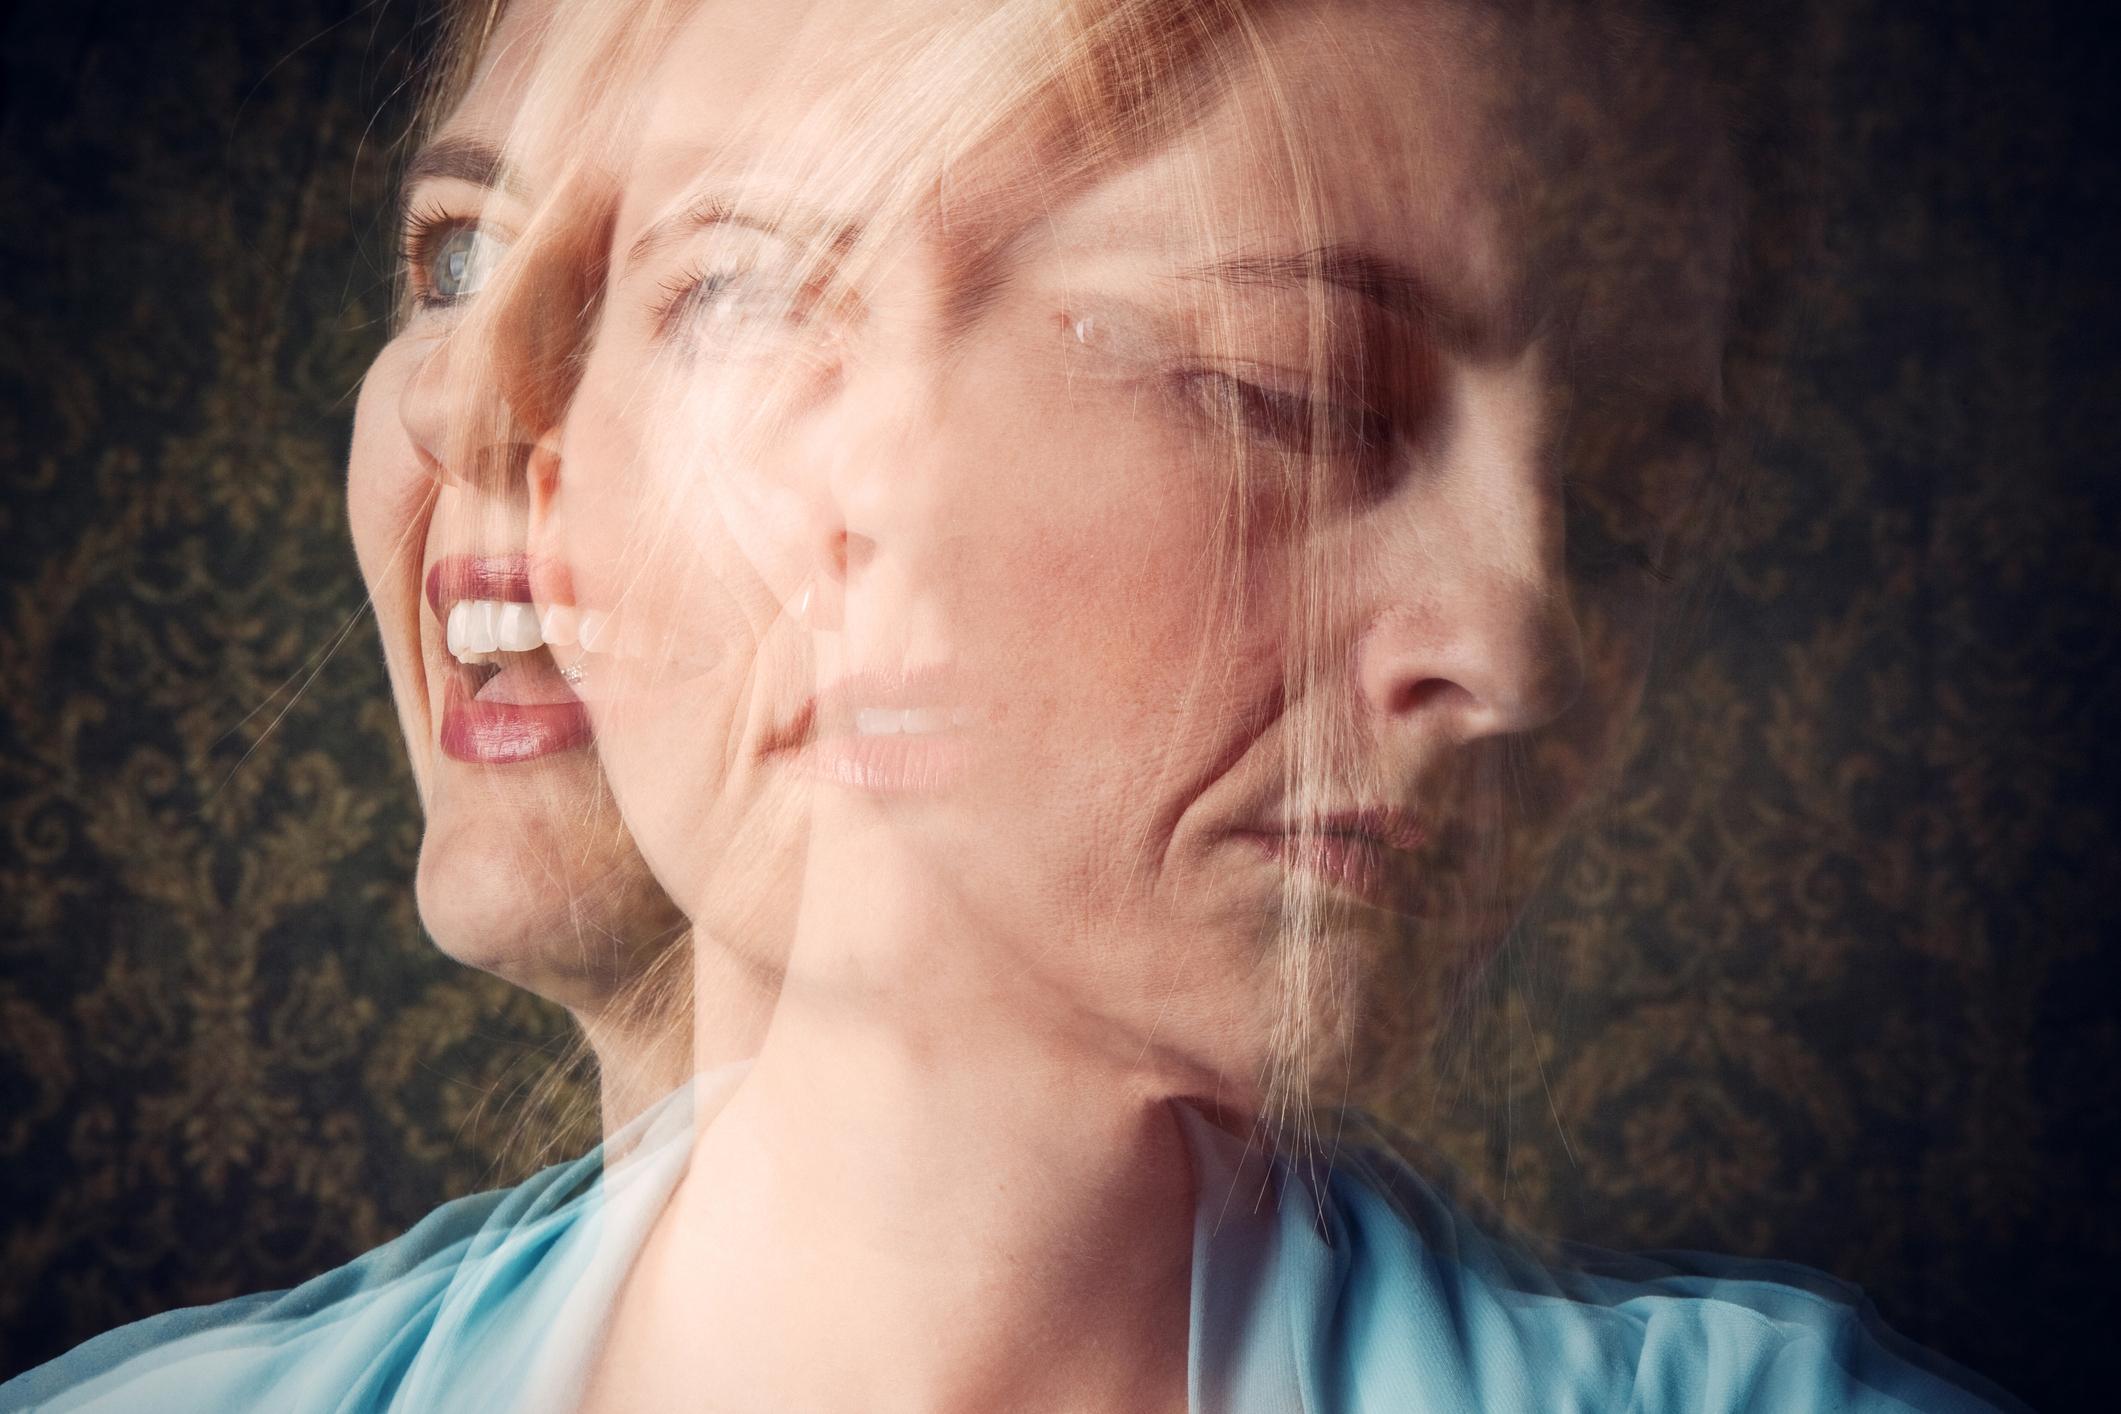 Woman Mood Disorder Concept